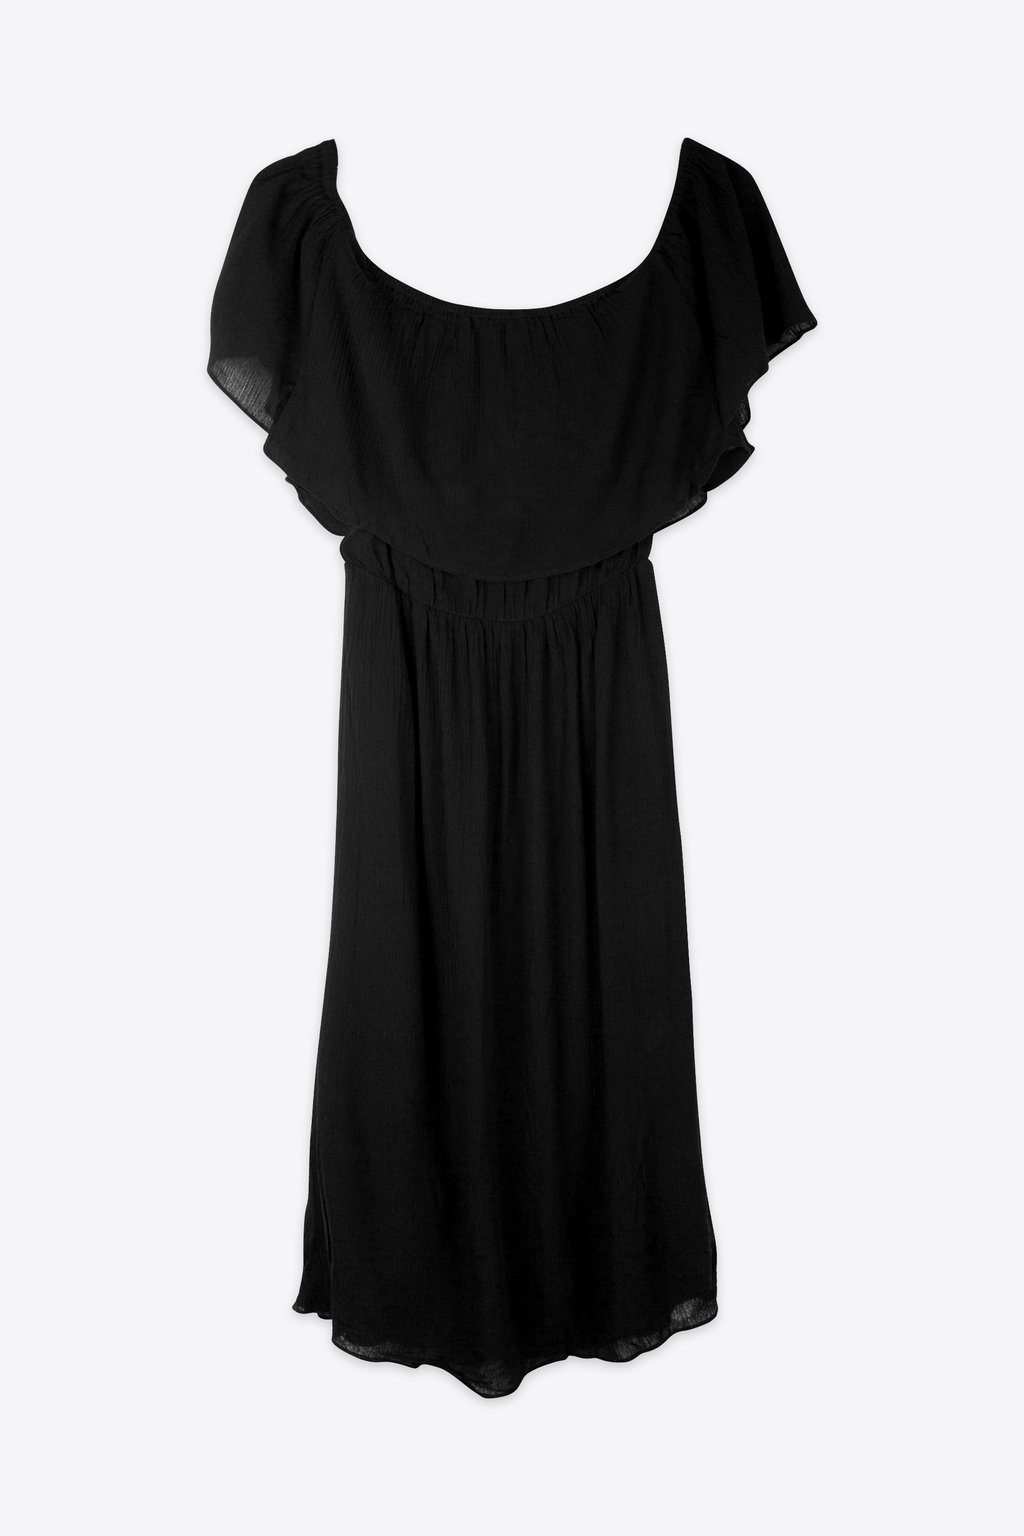 Dress H200 Black 7